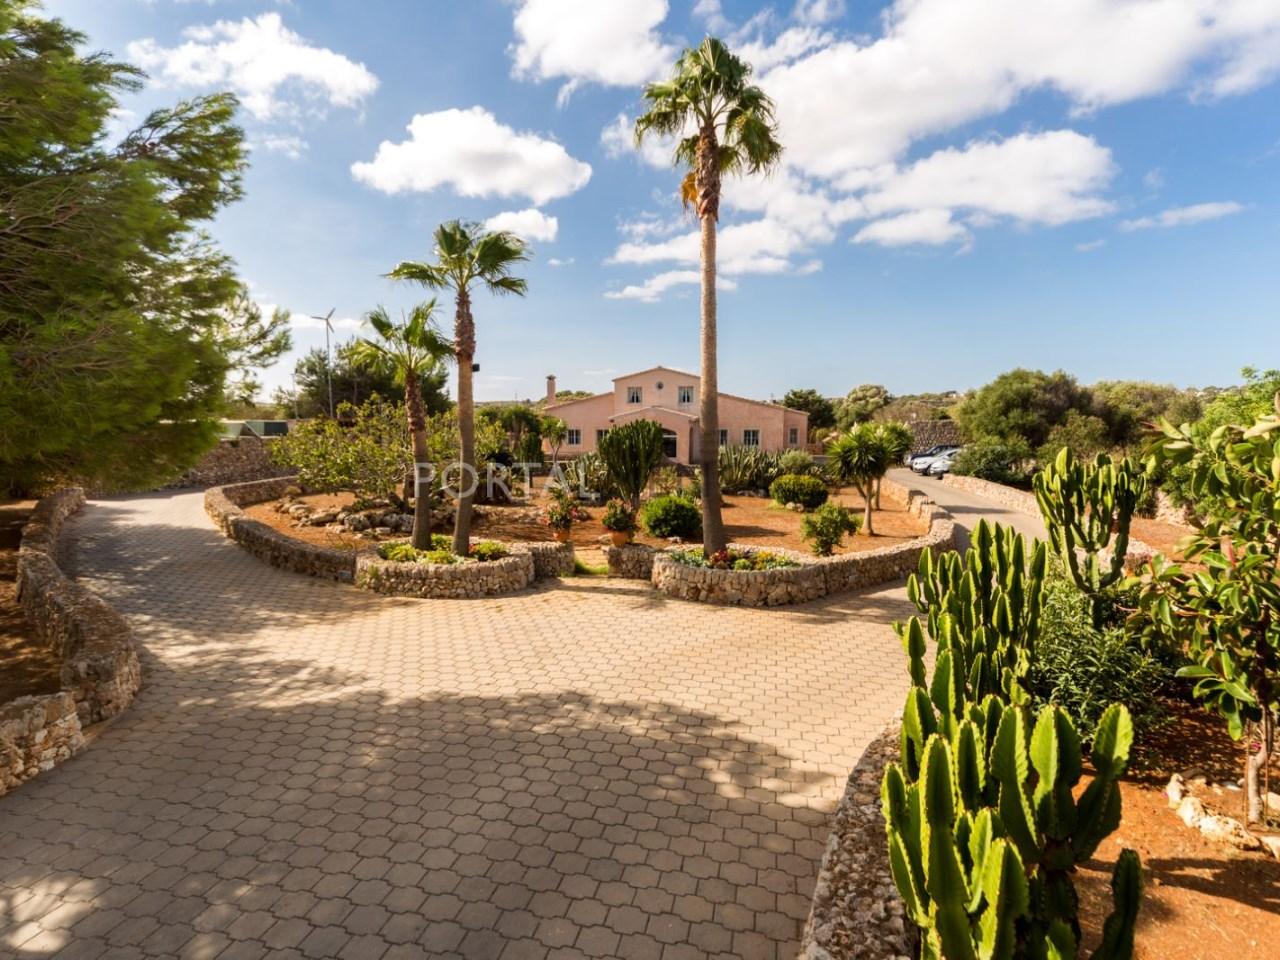 Casa de campo con piscina en Menorca (41 de 41)